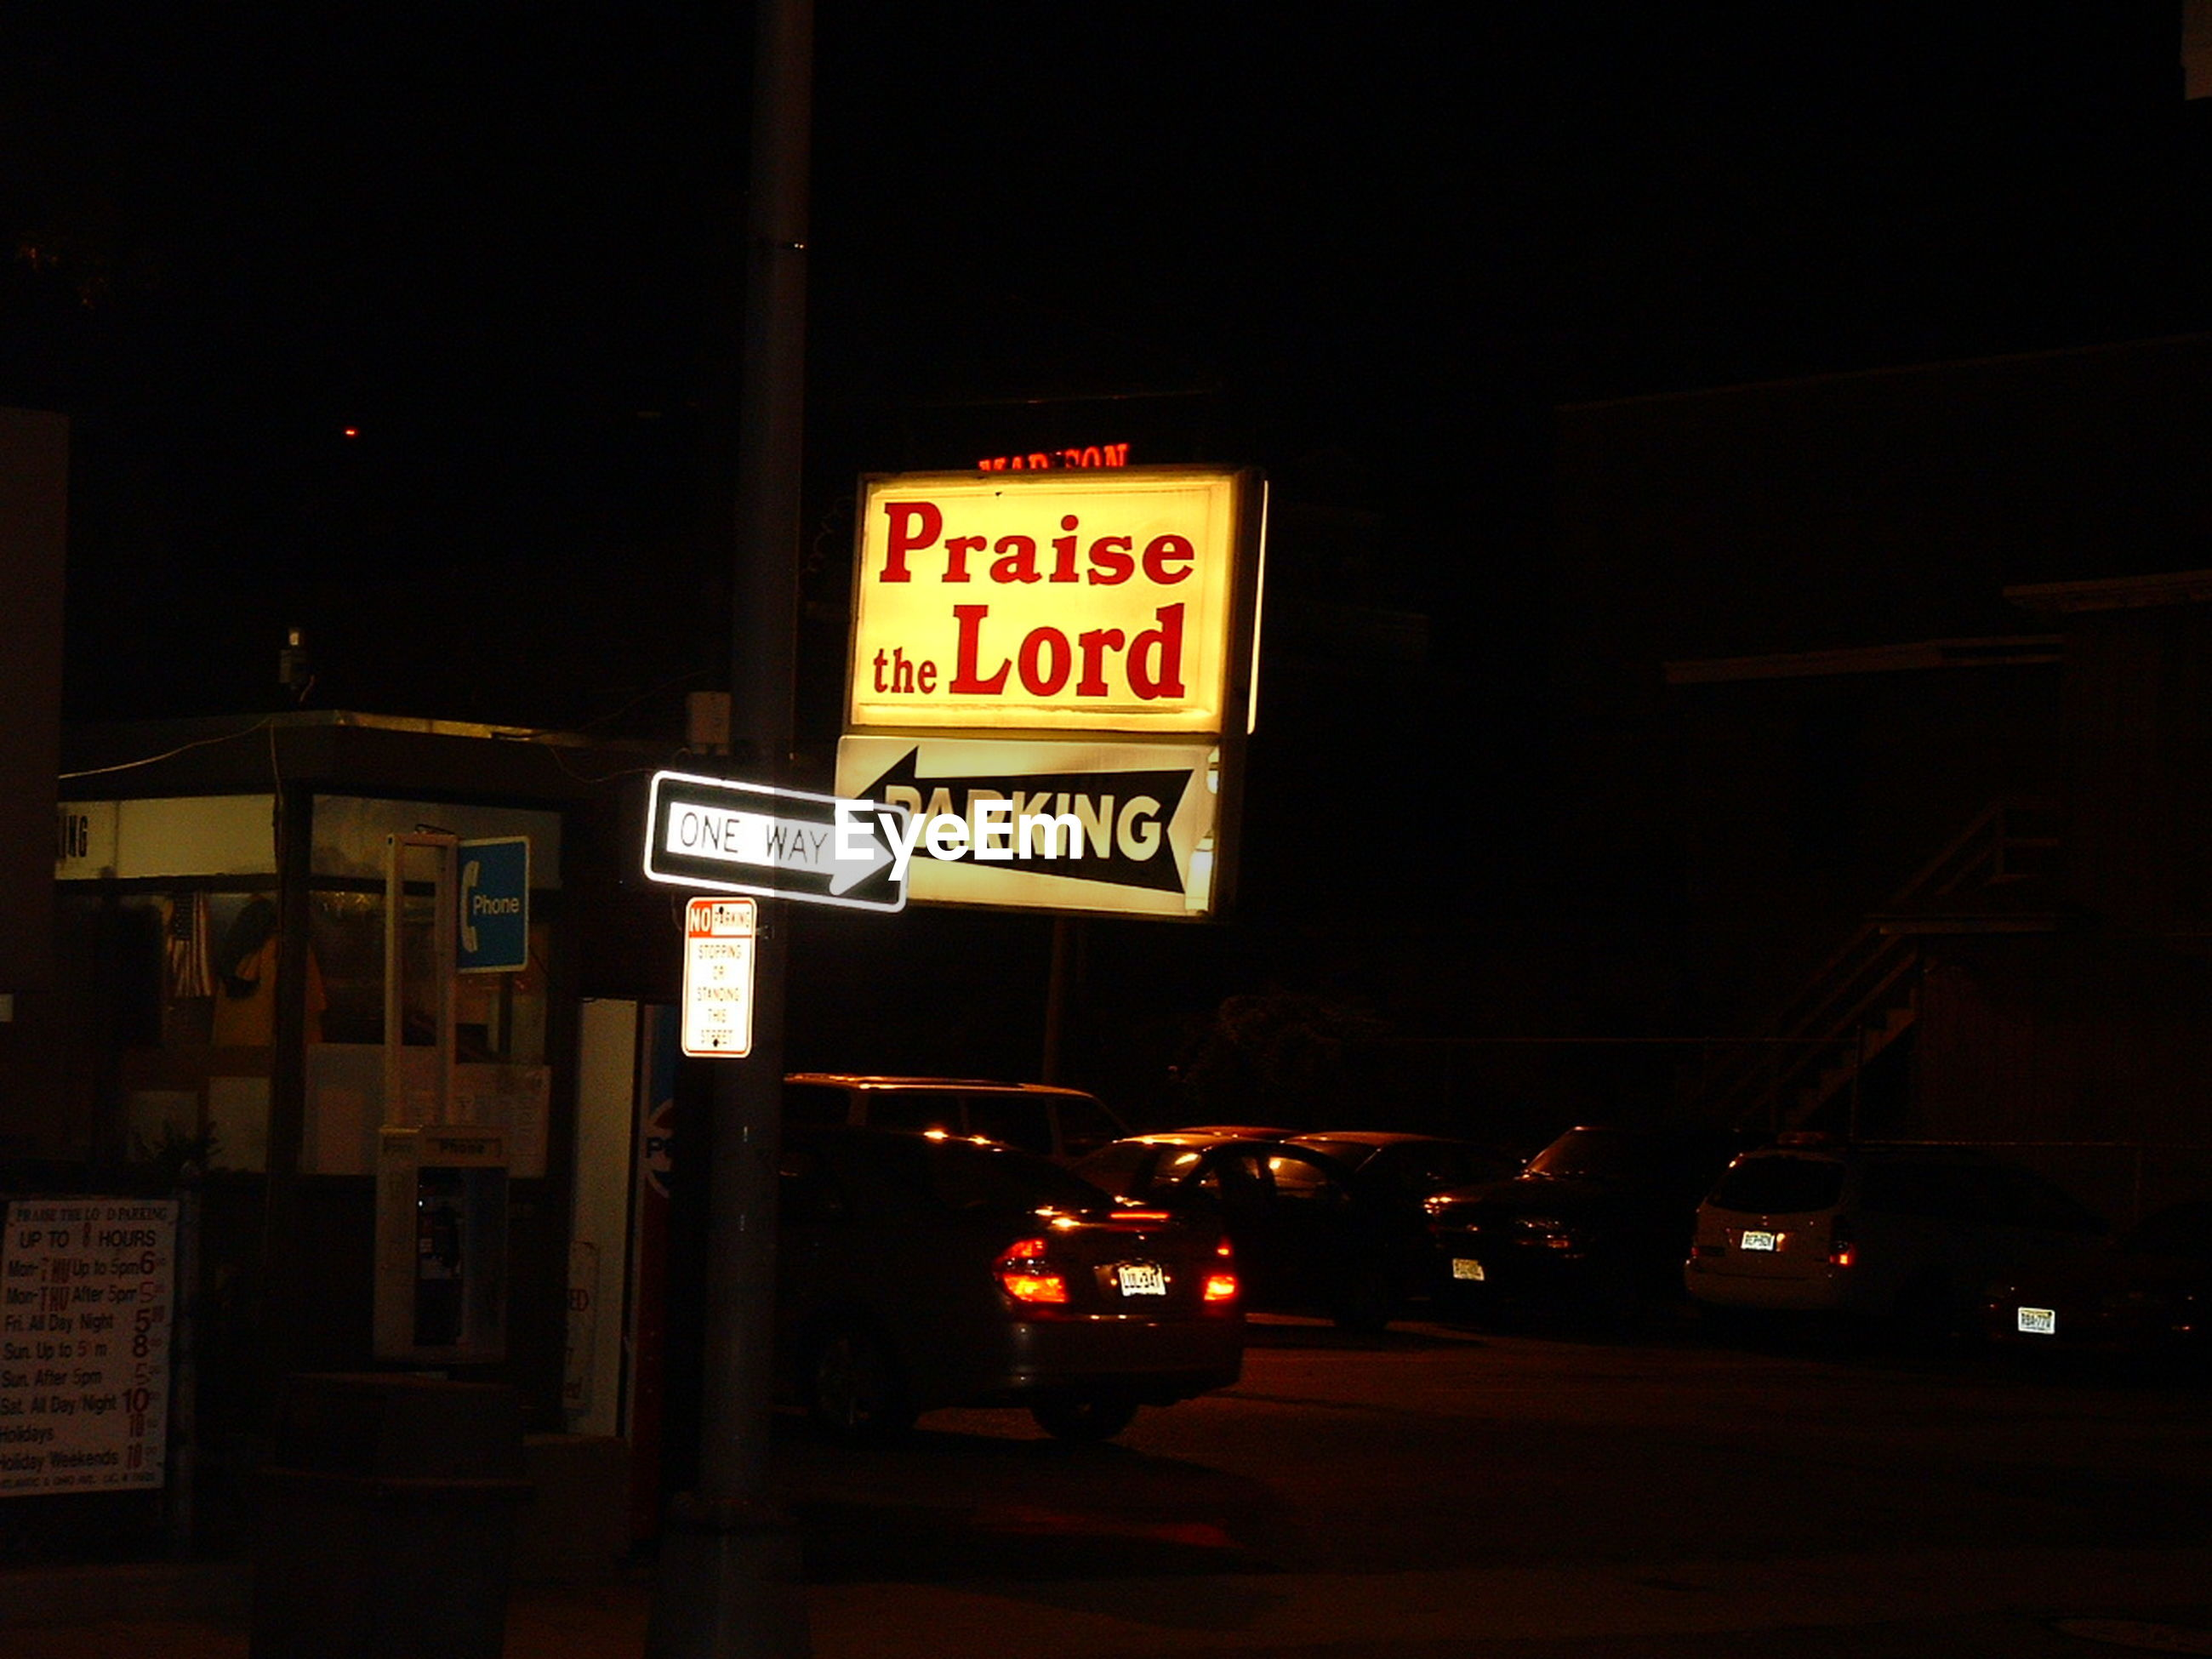 INFORMATION SIGN ON ILLUMINATED STREET LIGHT AT NIGHT